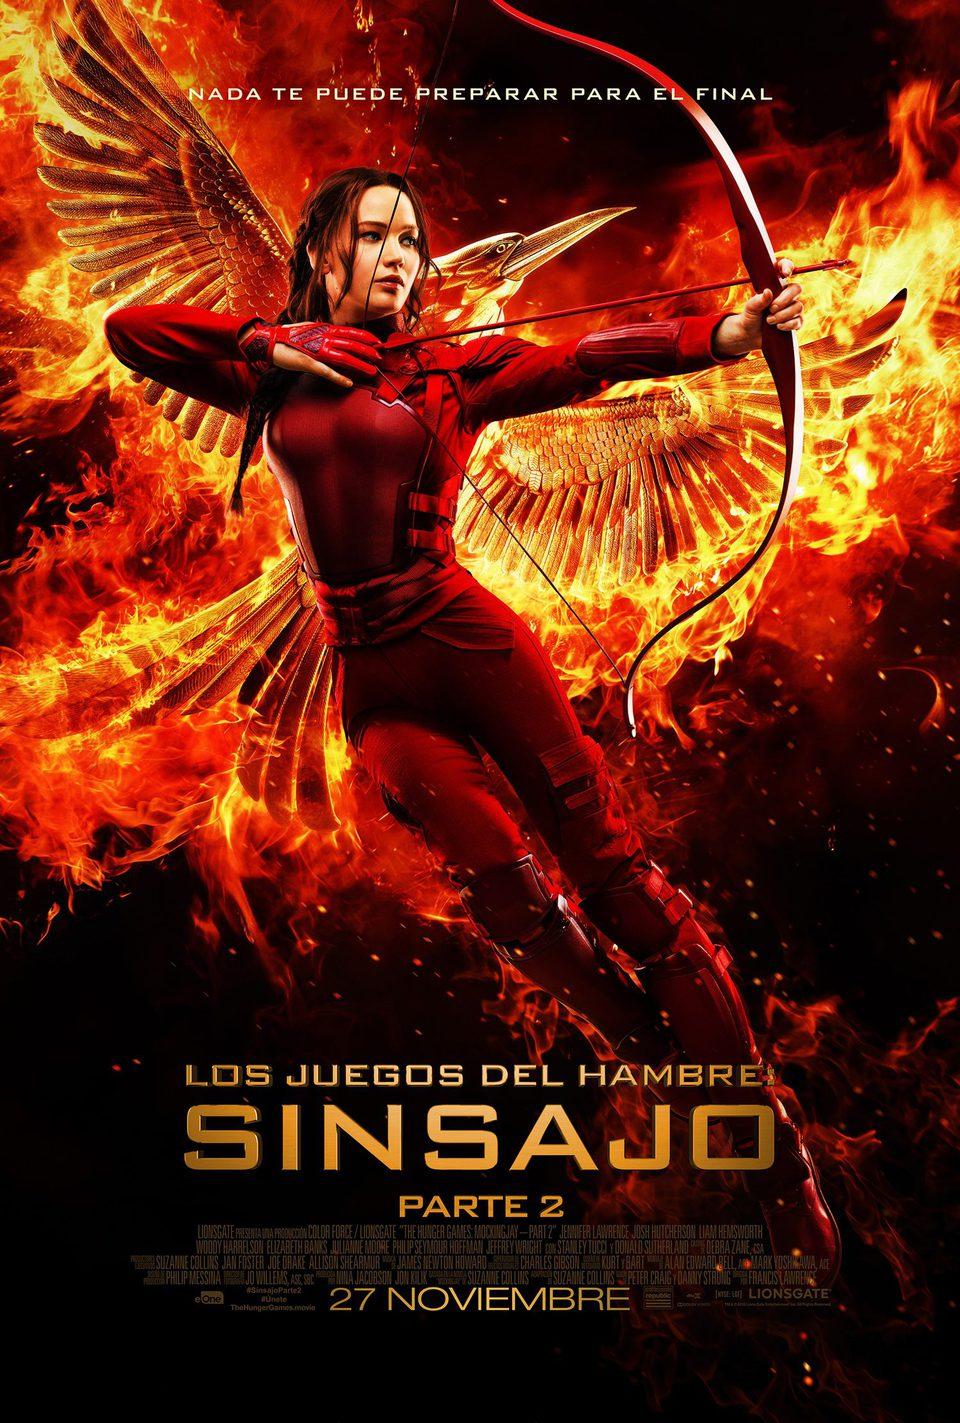 España 3 poster for The Hunger Games: Mockingjay - Part 2